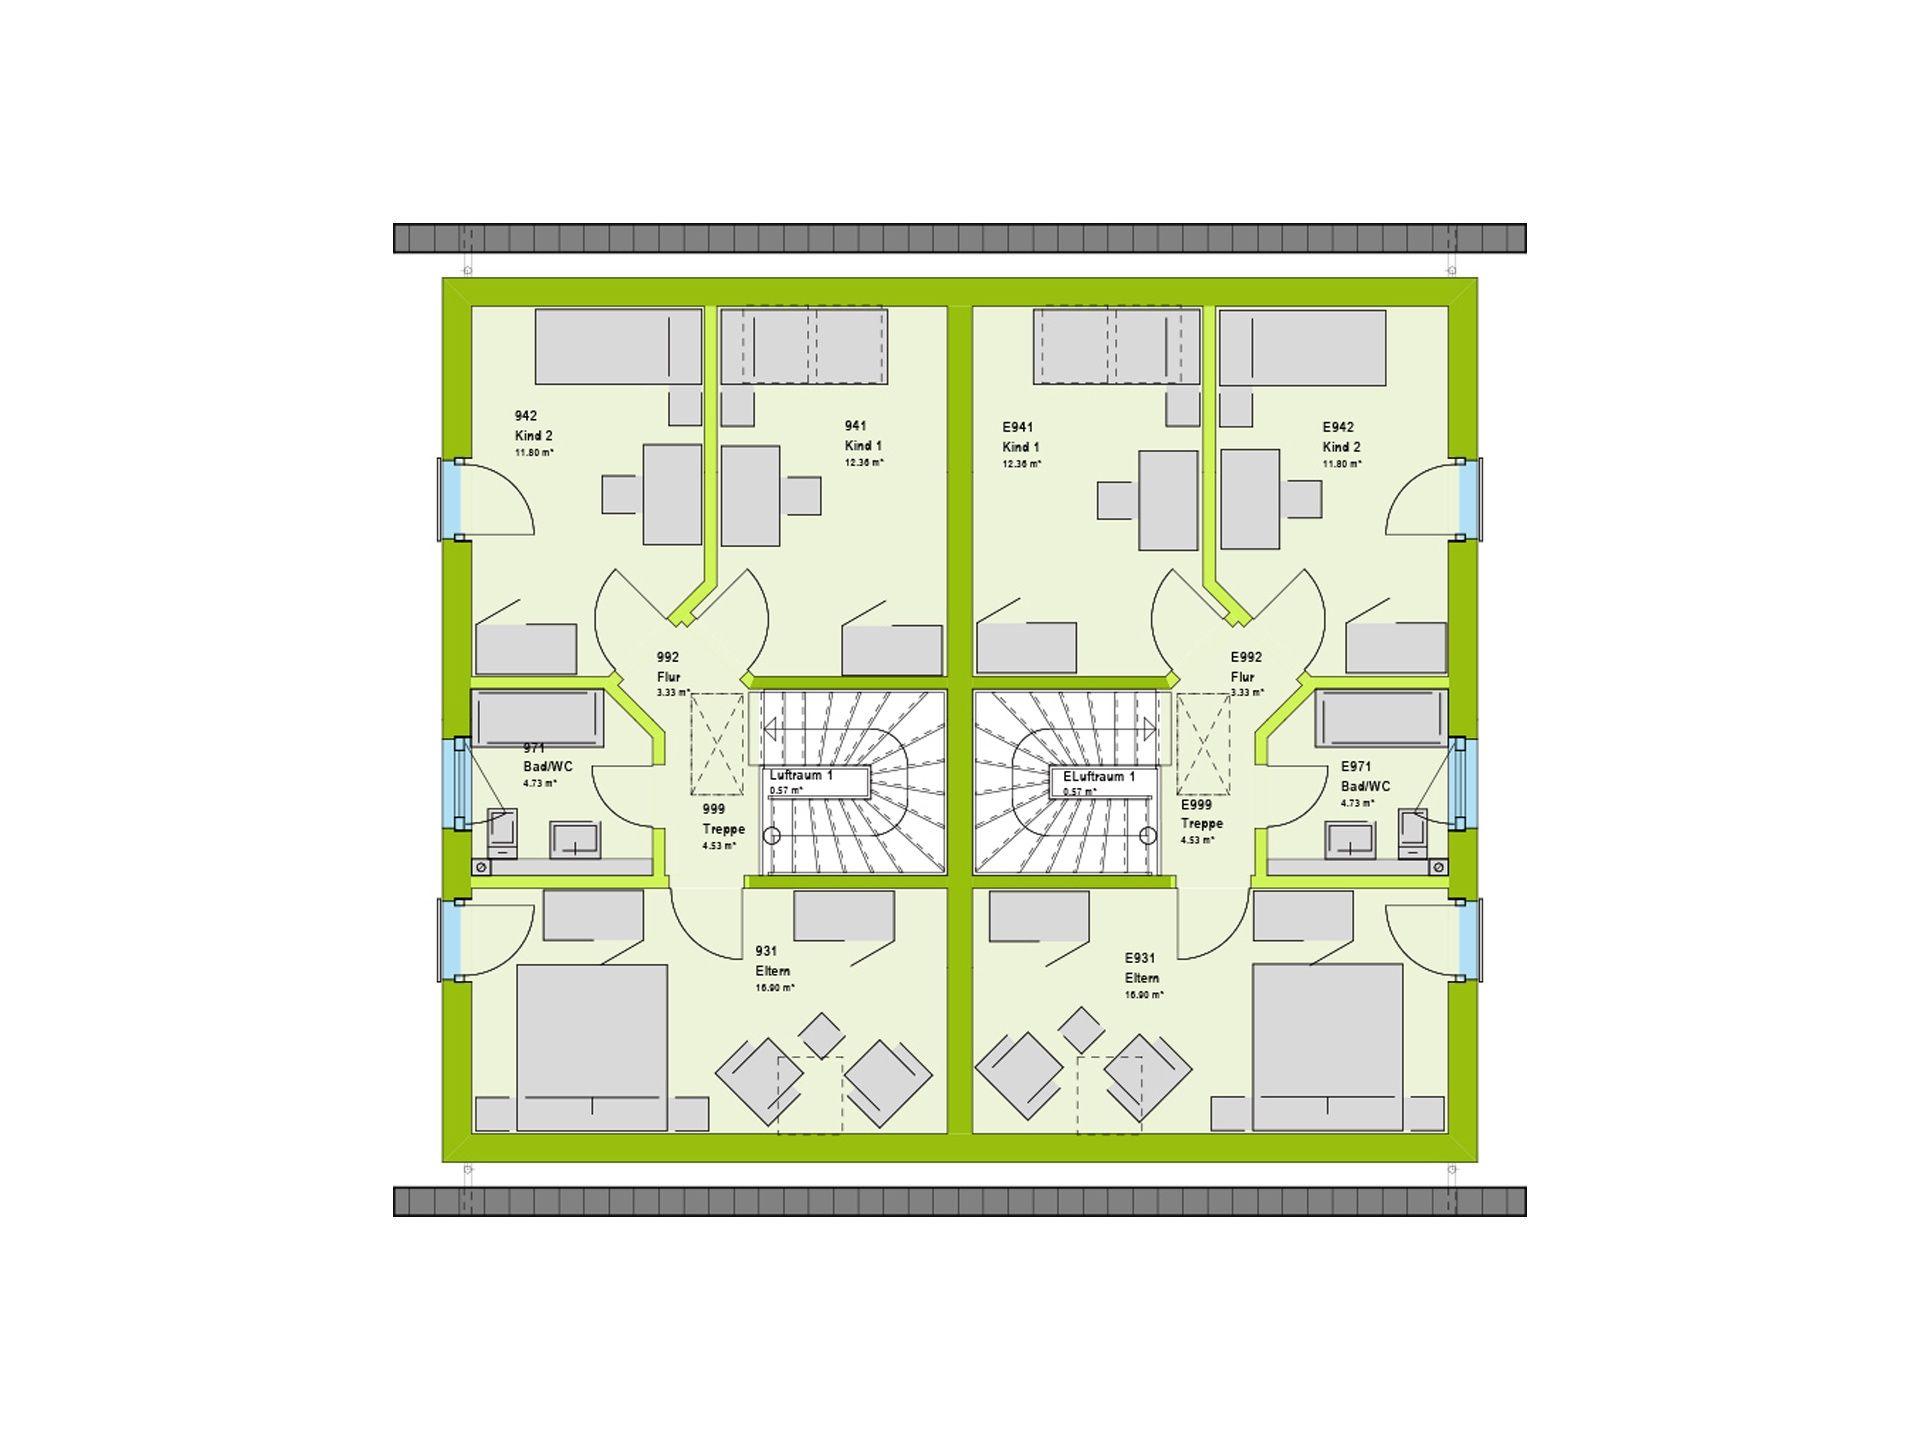 Nett 82 Elektriker Haus Schaltplan Bild Ideen Ideen - Der Schaltplan ...